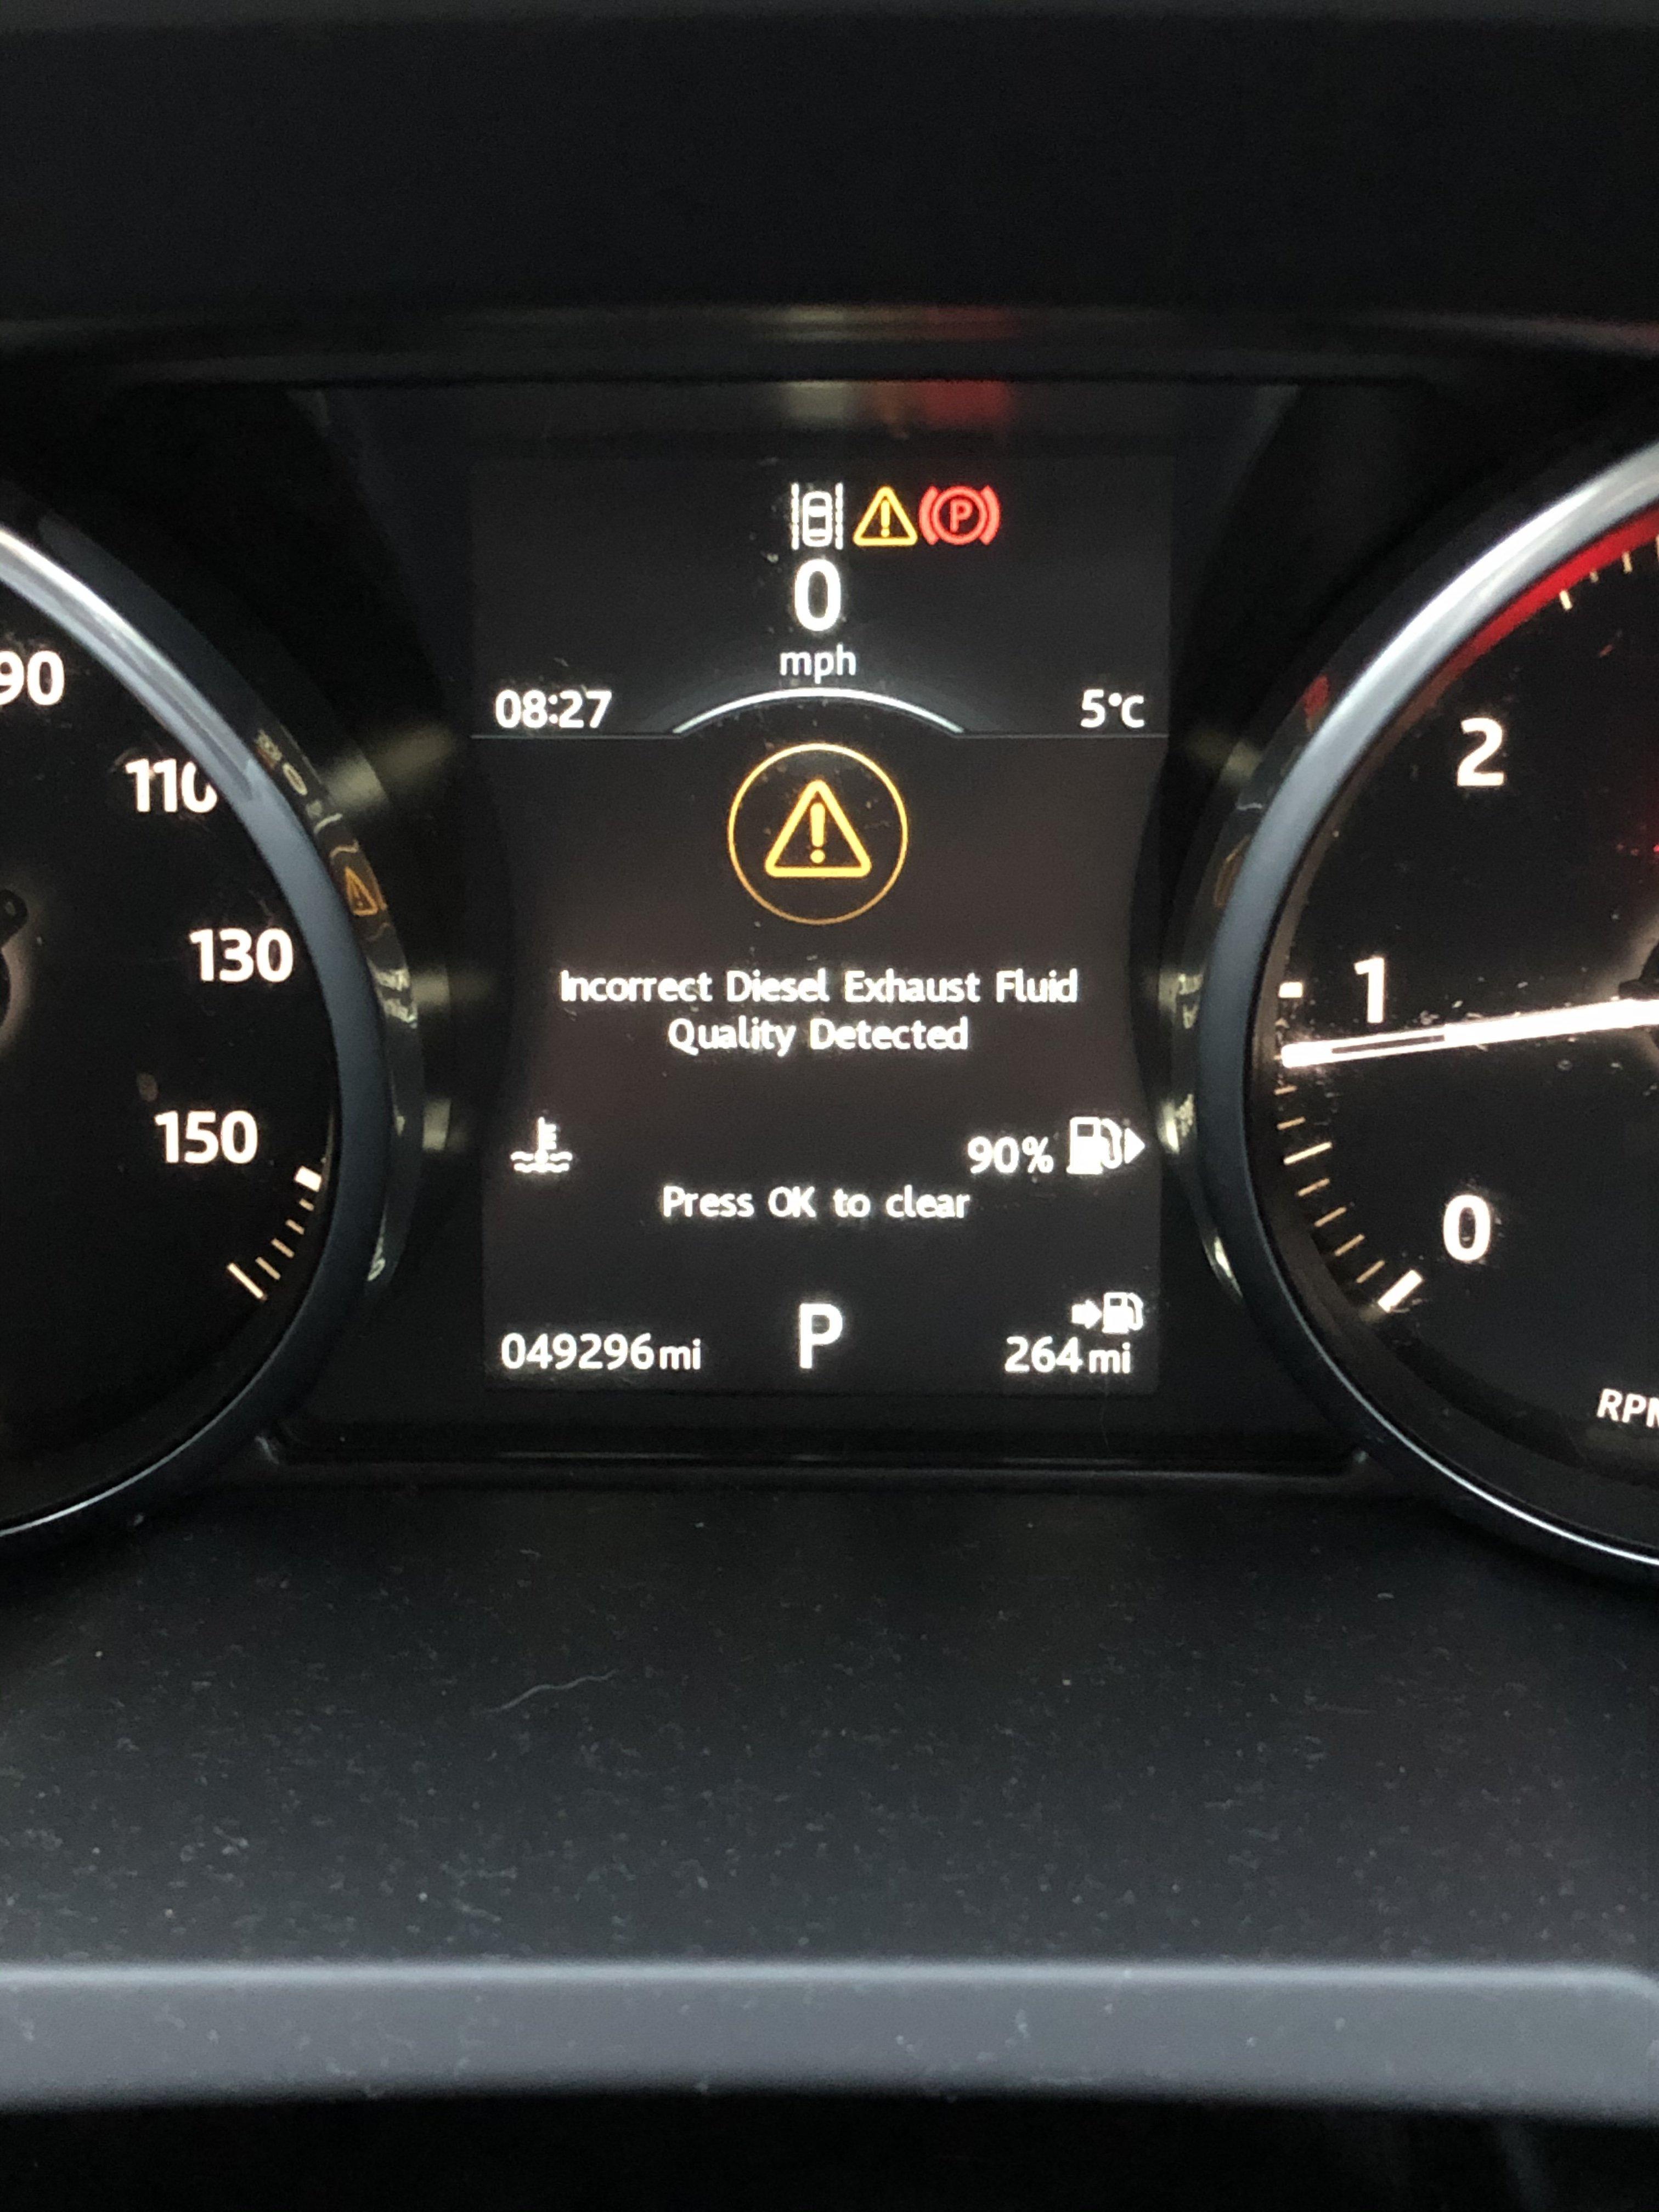 incorrect diesel exhaust fluid detected